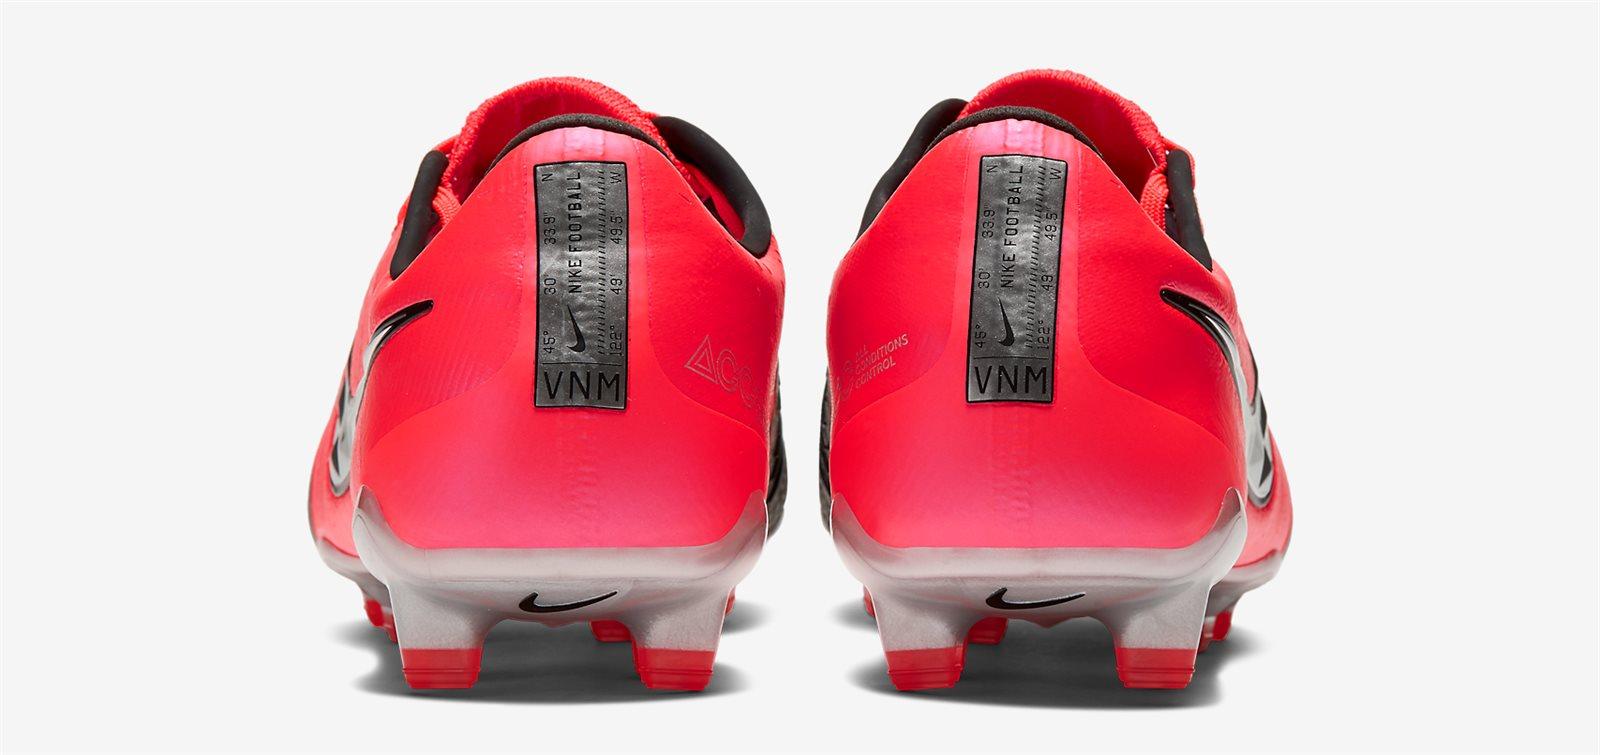 Zapatillas de Futbol para Hombre Nike Phantom Venom Elite FG rojo